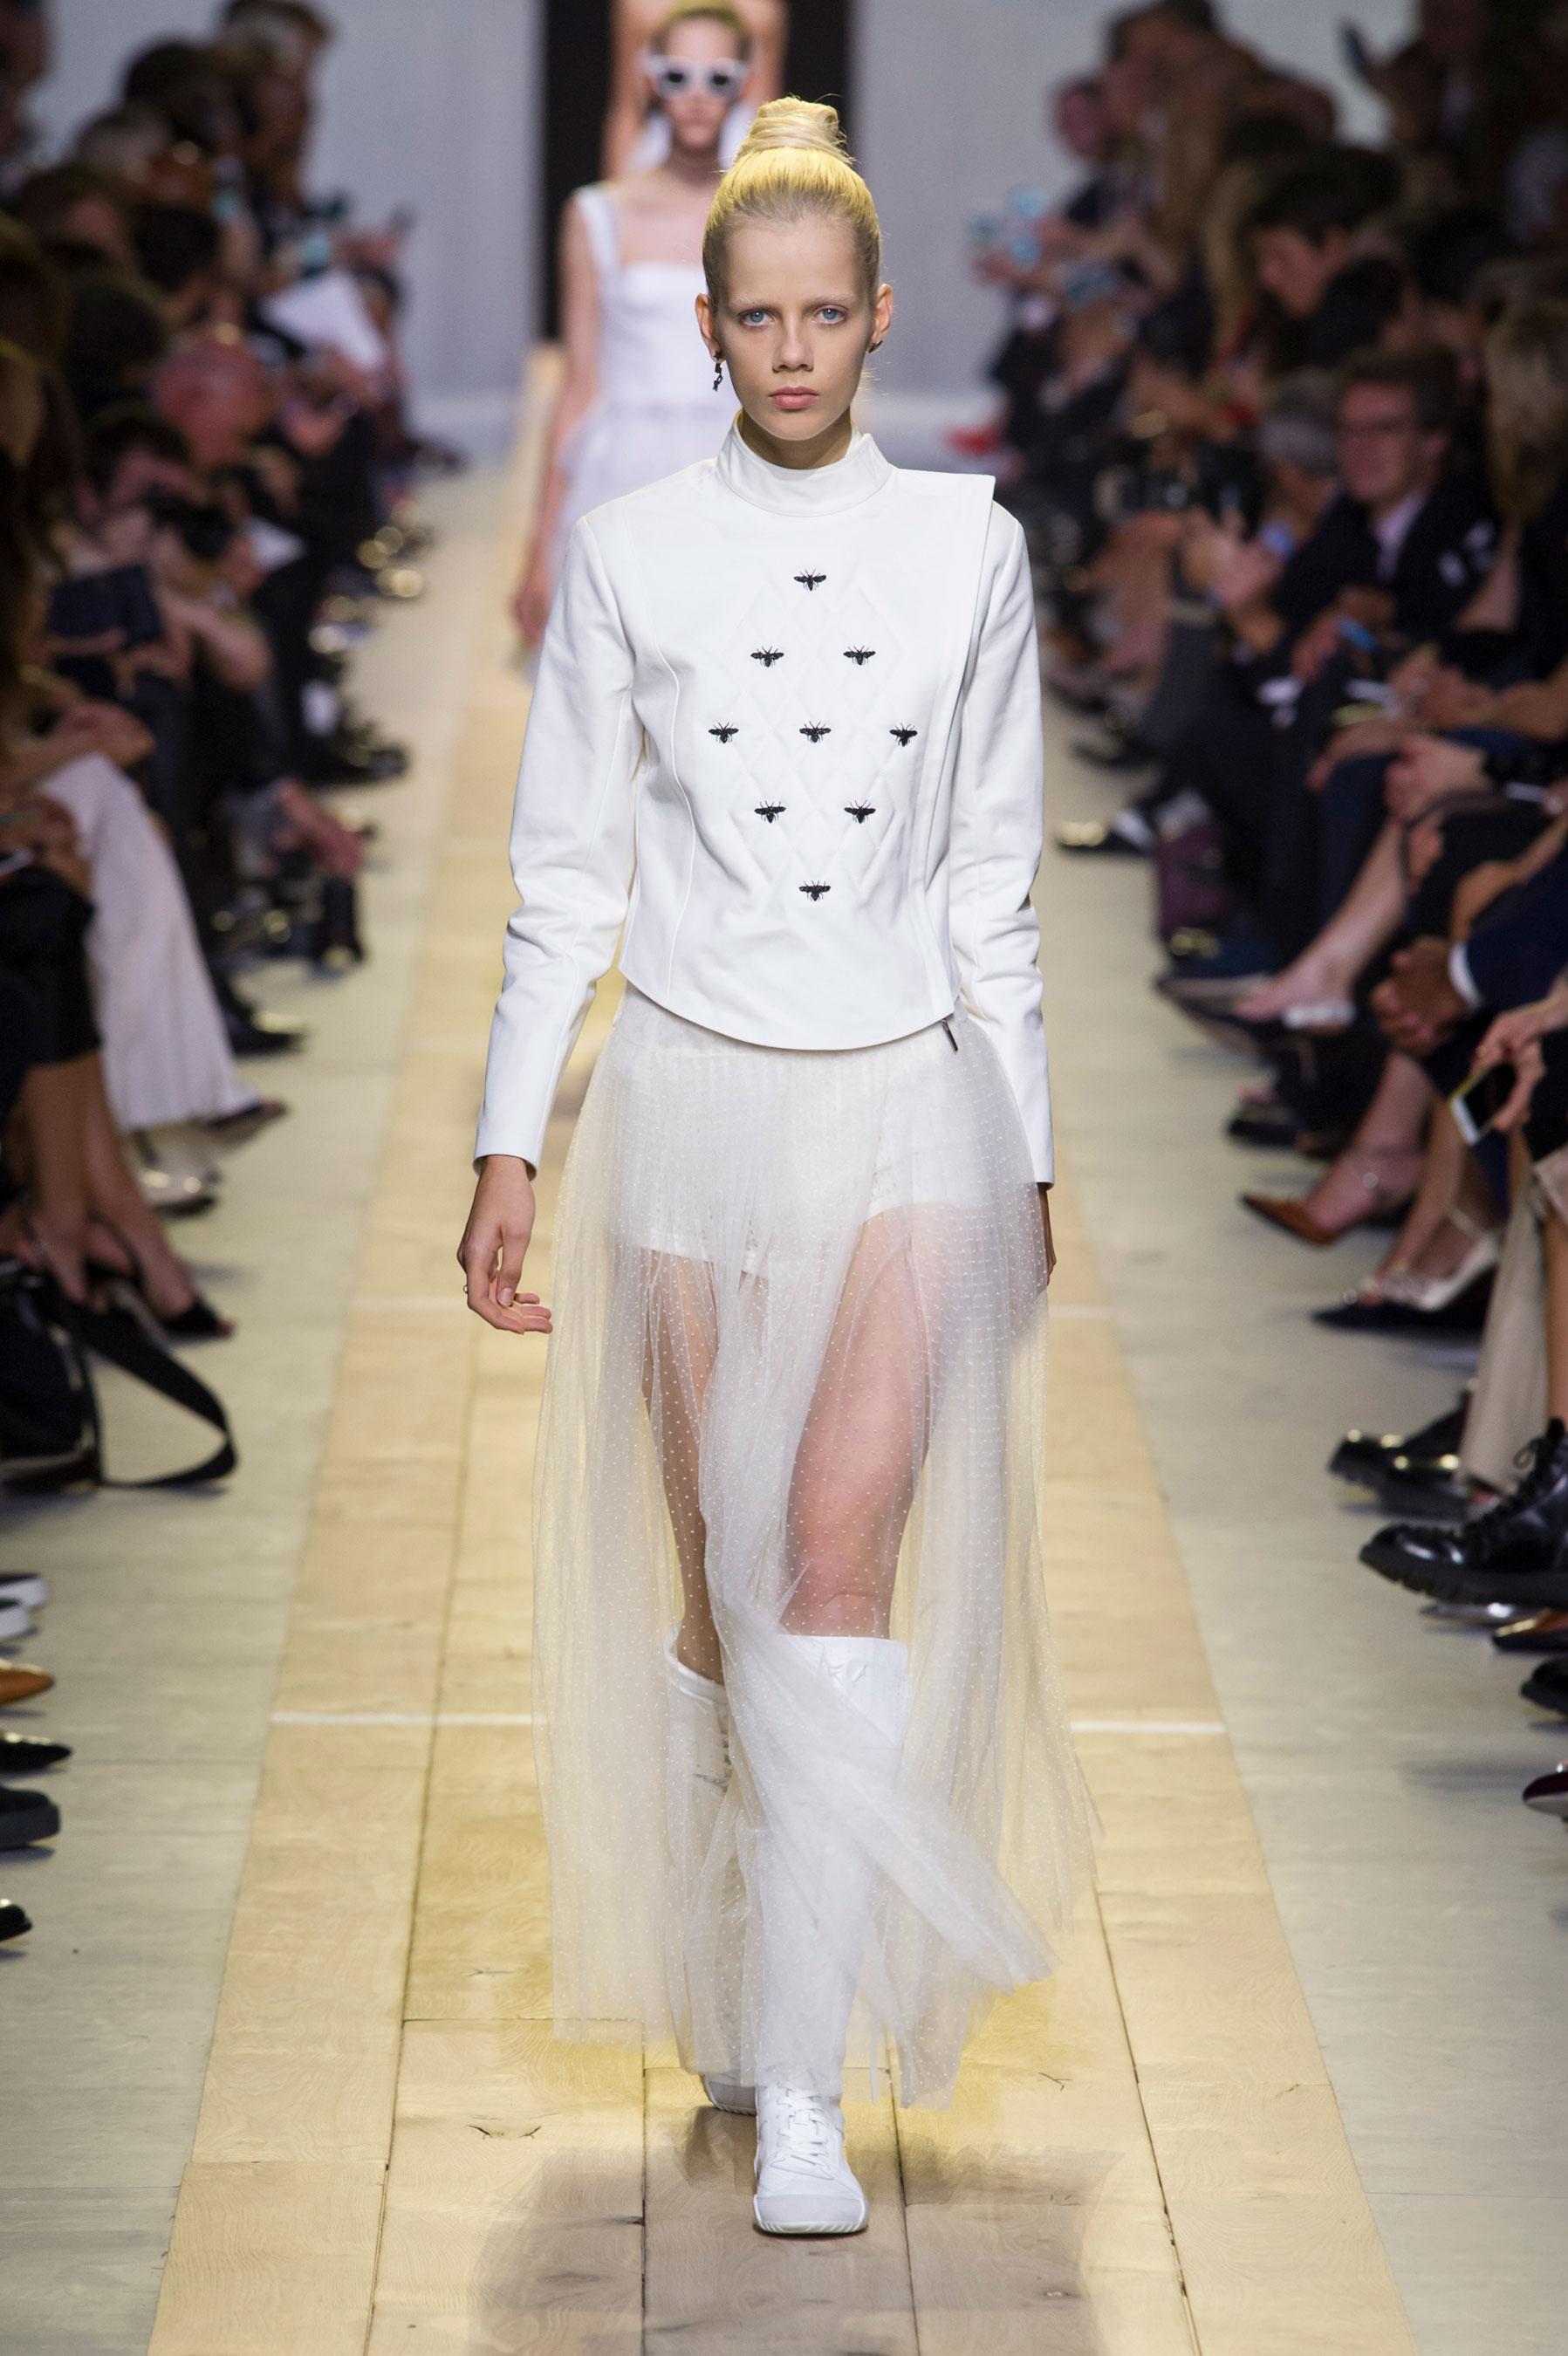 Défilé Christian Dior Printemps-été 2017 Prêt-à-porter - Madame Figaro 320716903f62